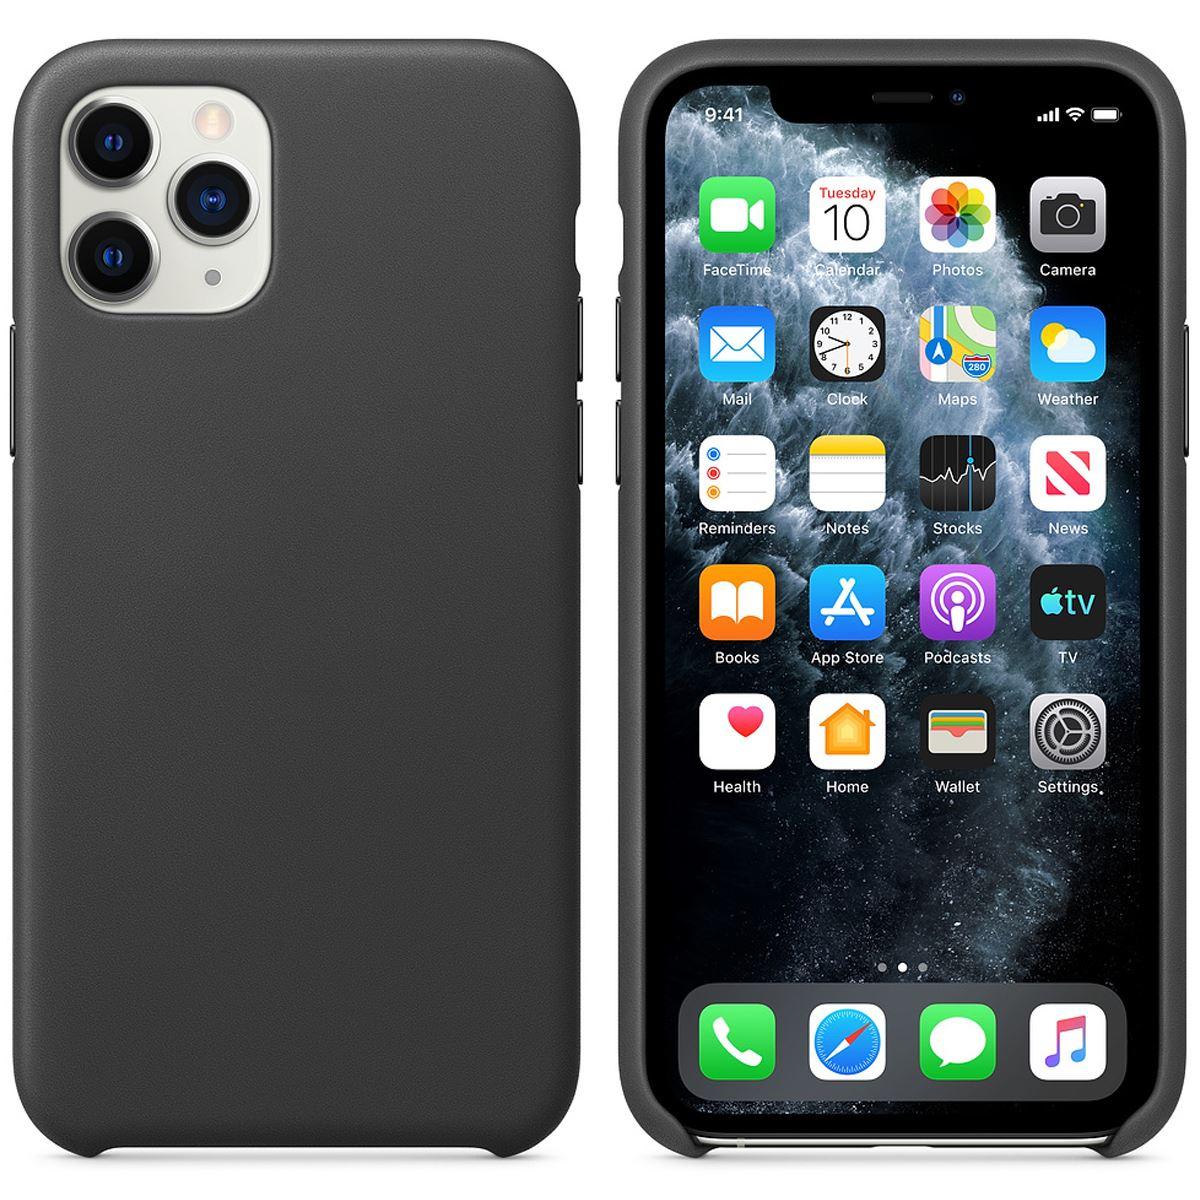 Leather-Slim-Case-Apple-iPhone-10-8-7-Plus-6s-5-Original-PU-Soft-Silicone-Cover thumbnail 7